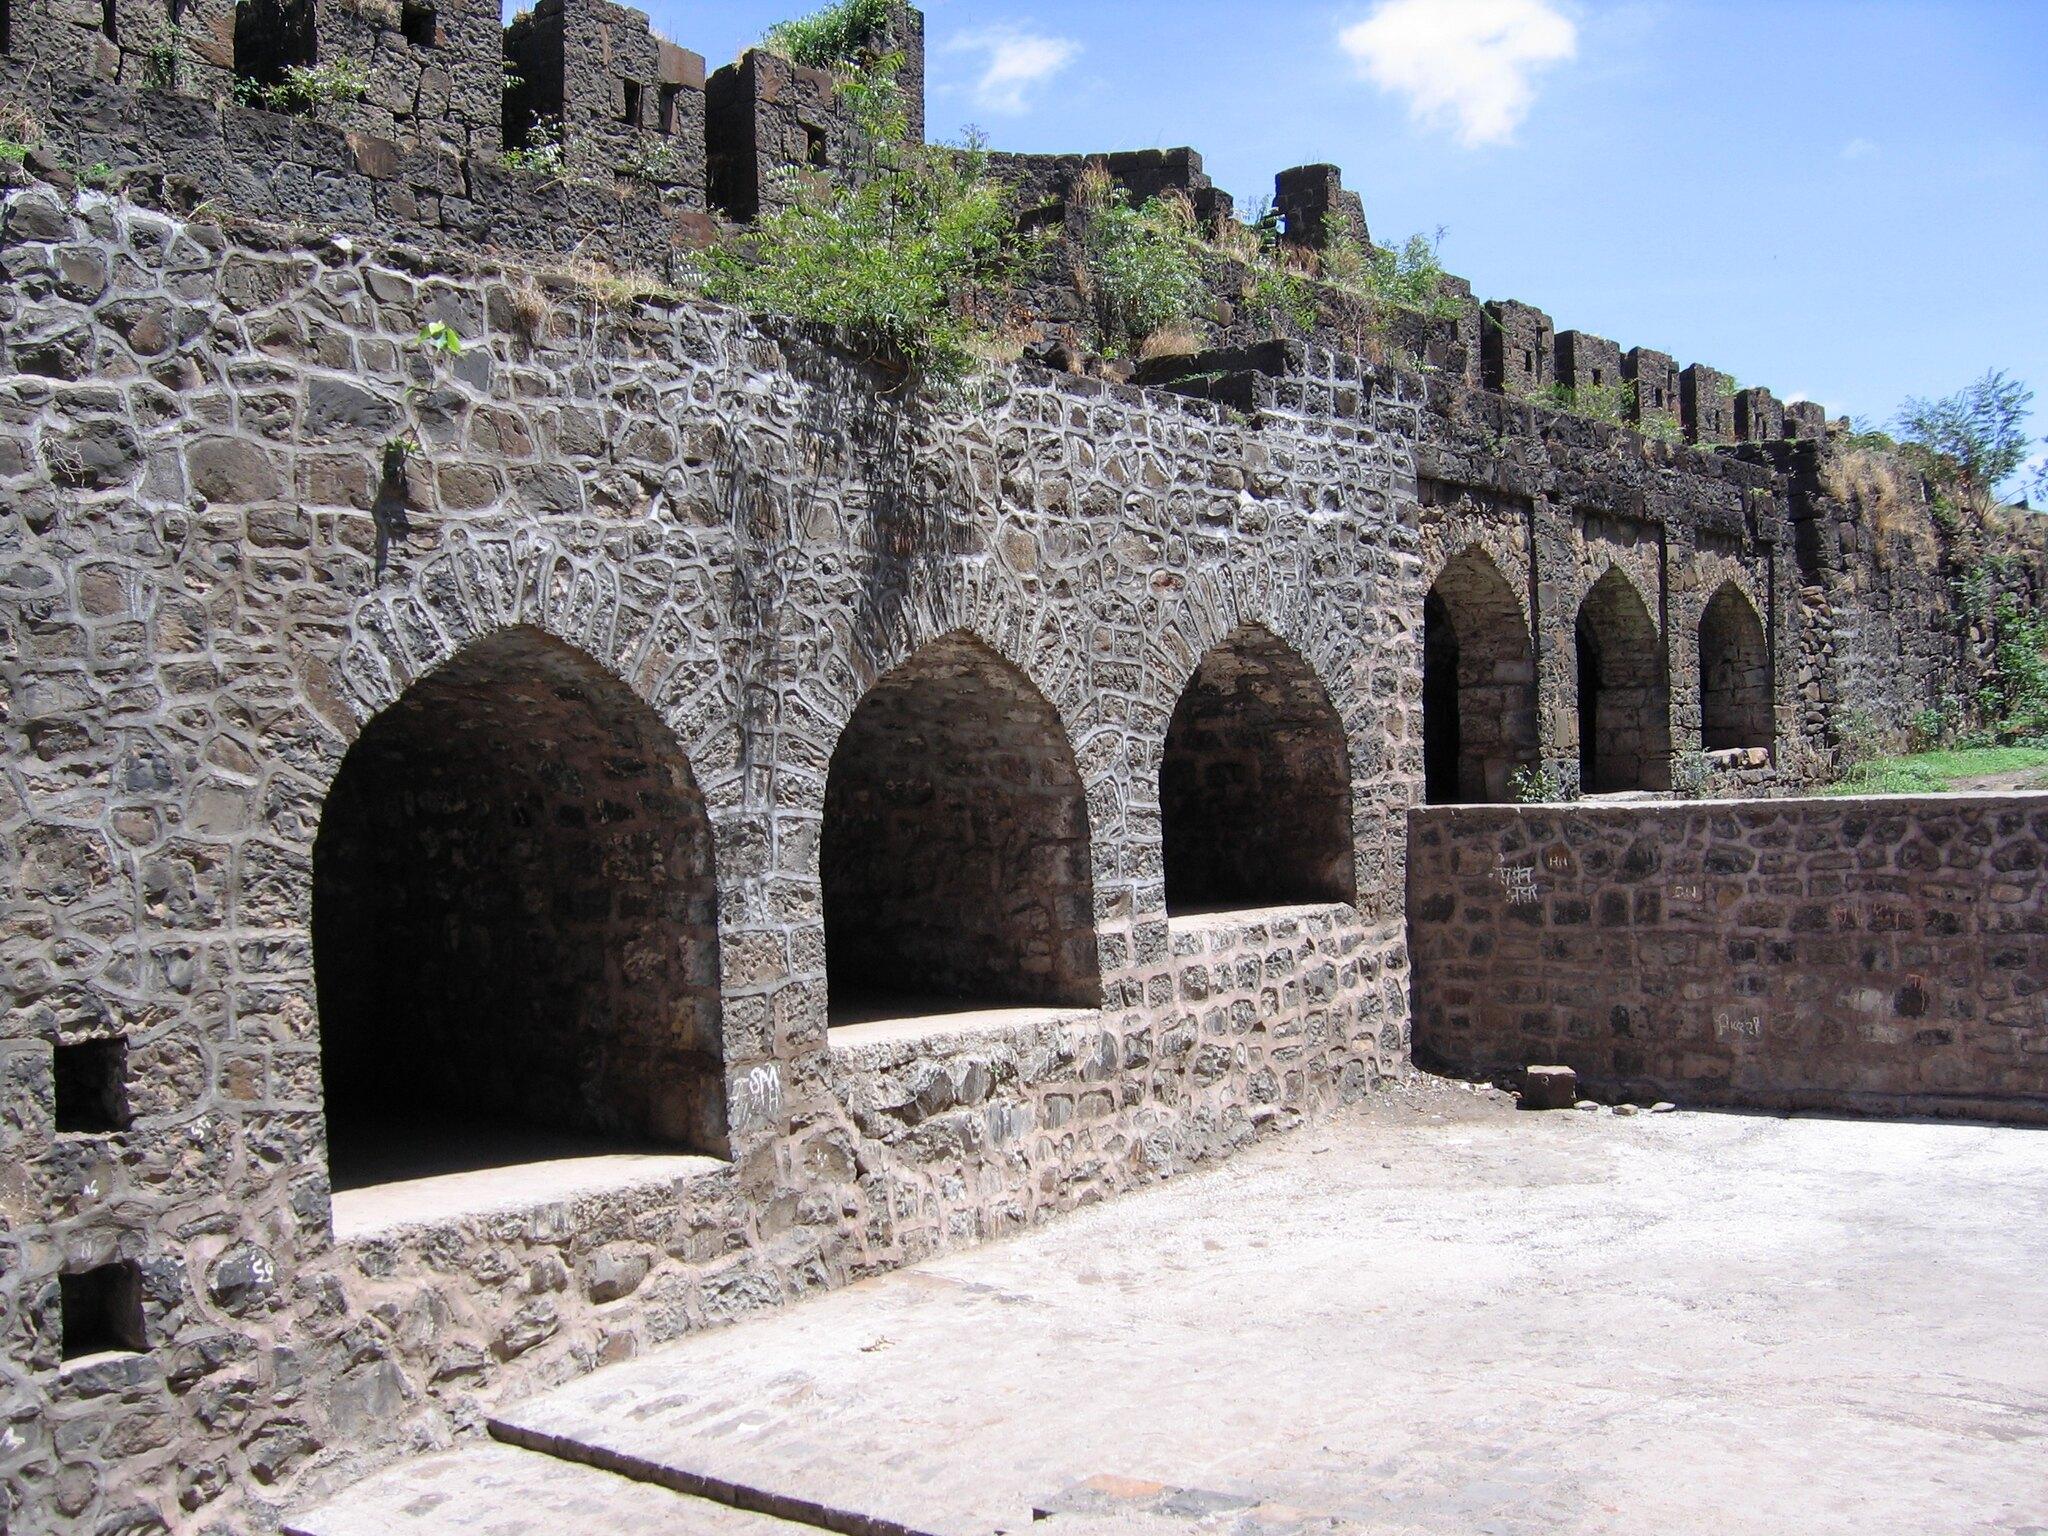 Structures Inside the Naldurg Fort